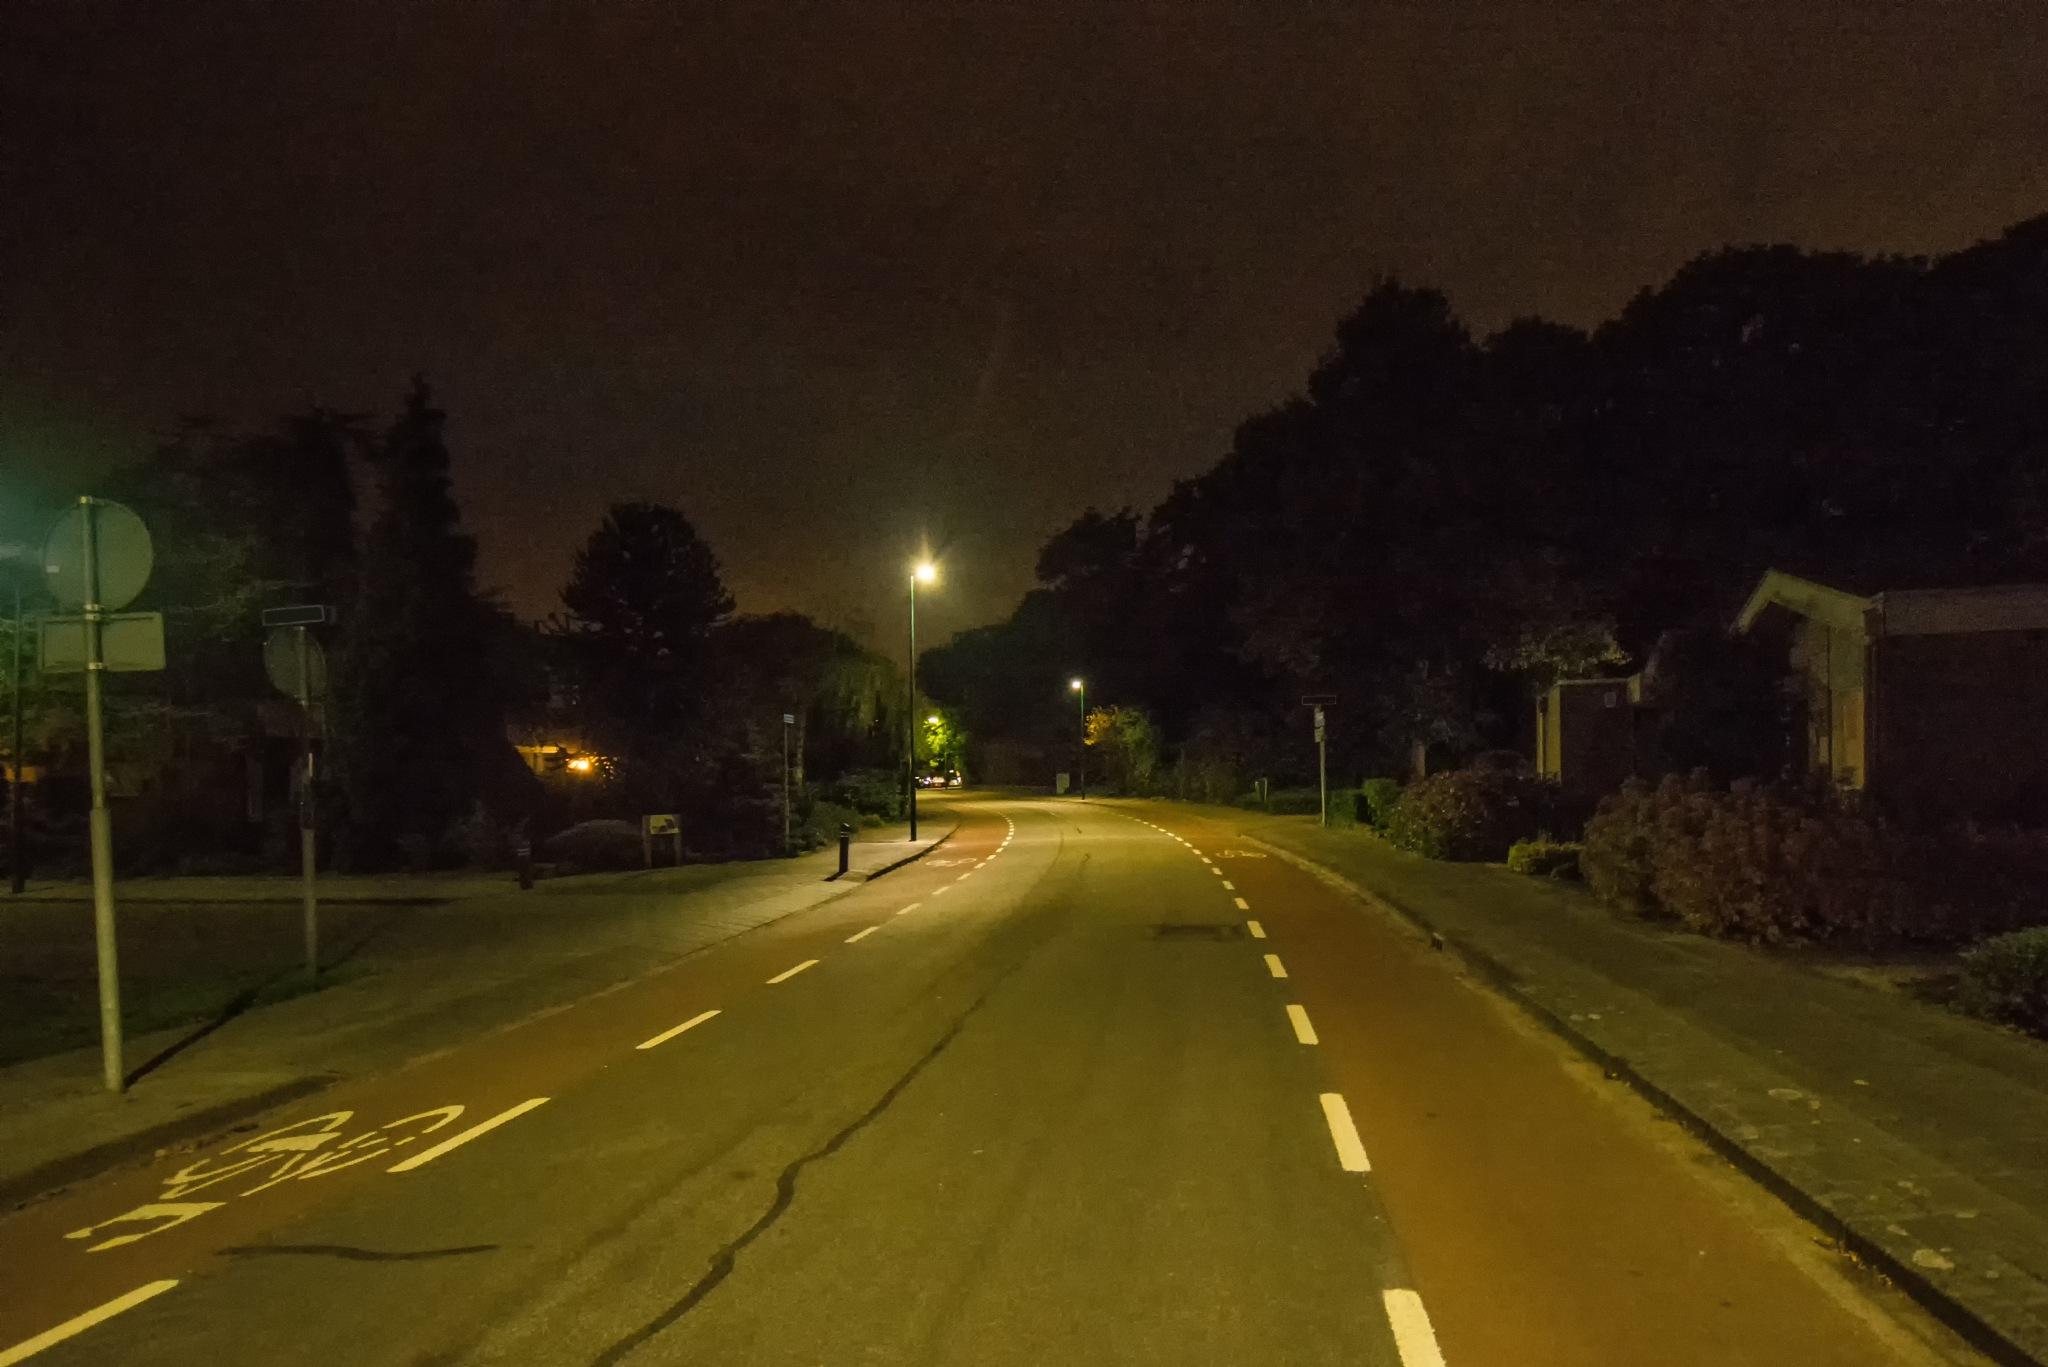 New Streetlight_II by HaWaFoTo